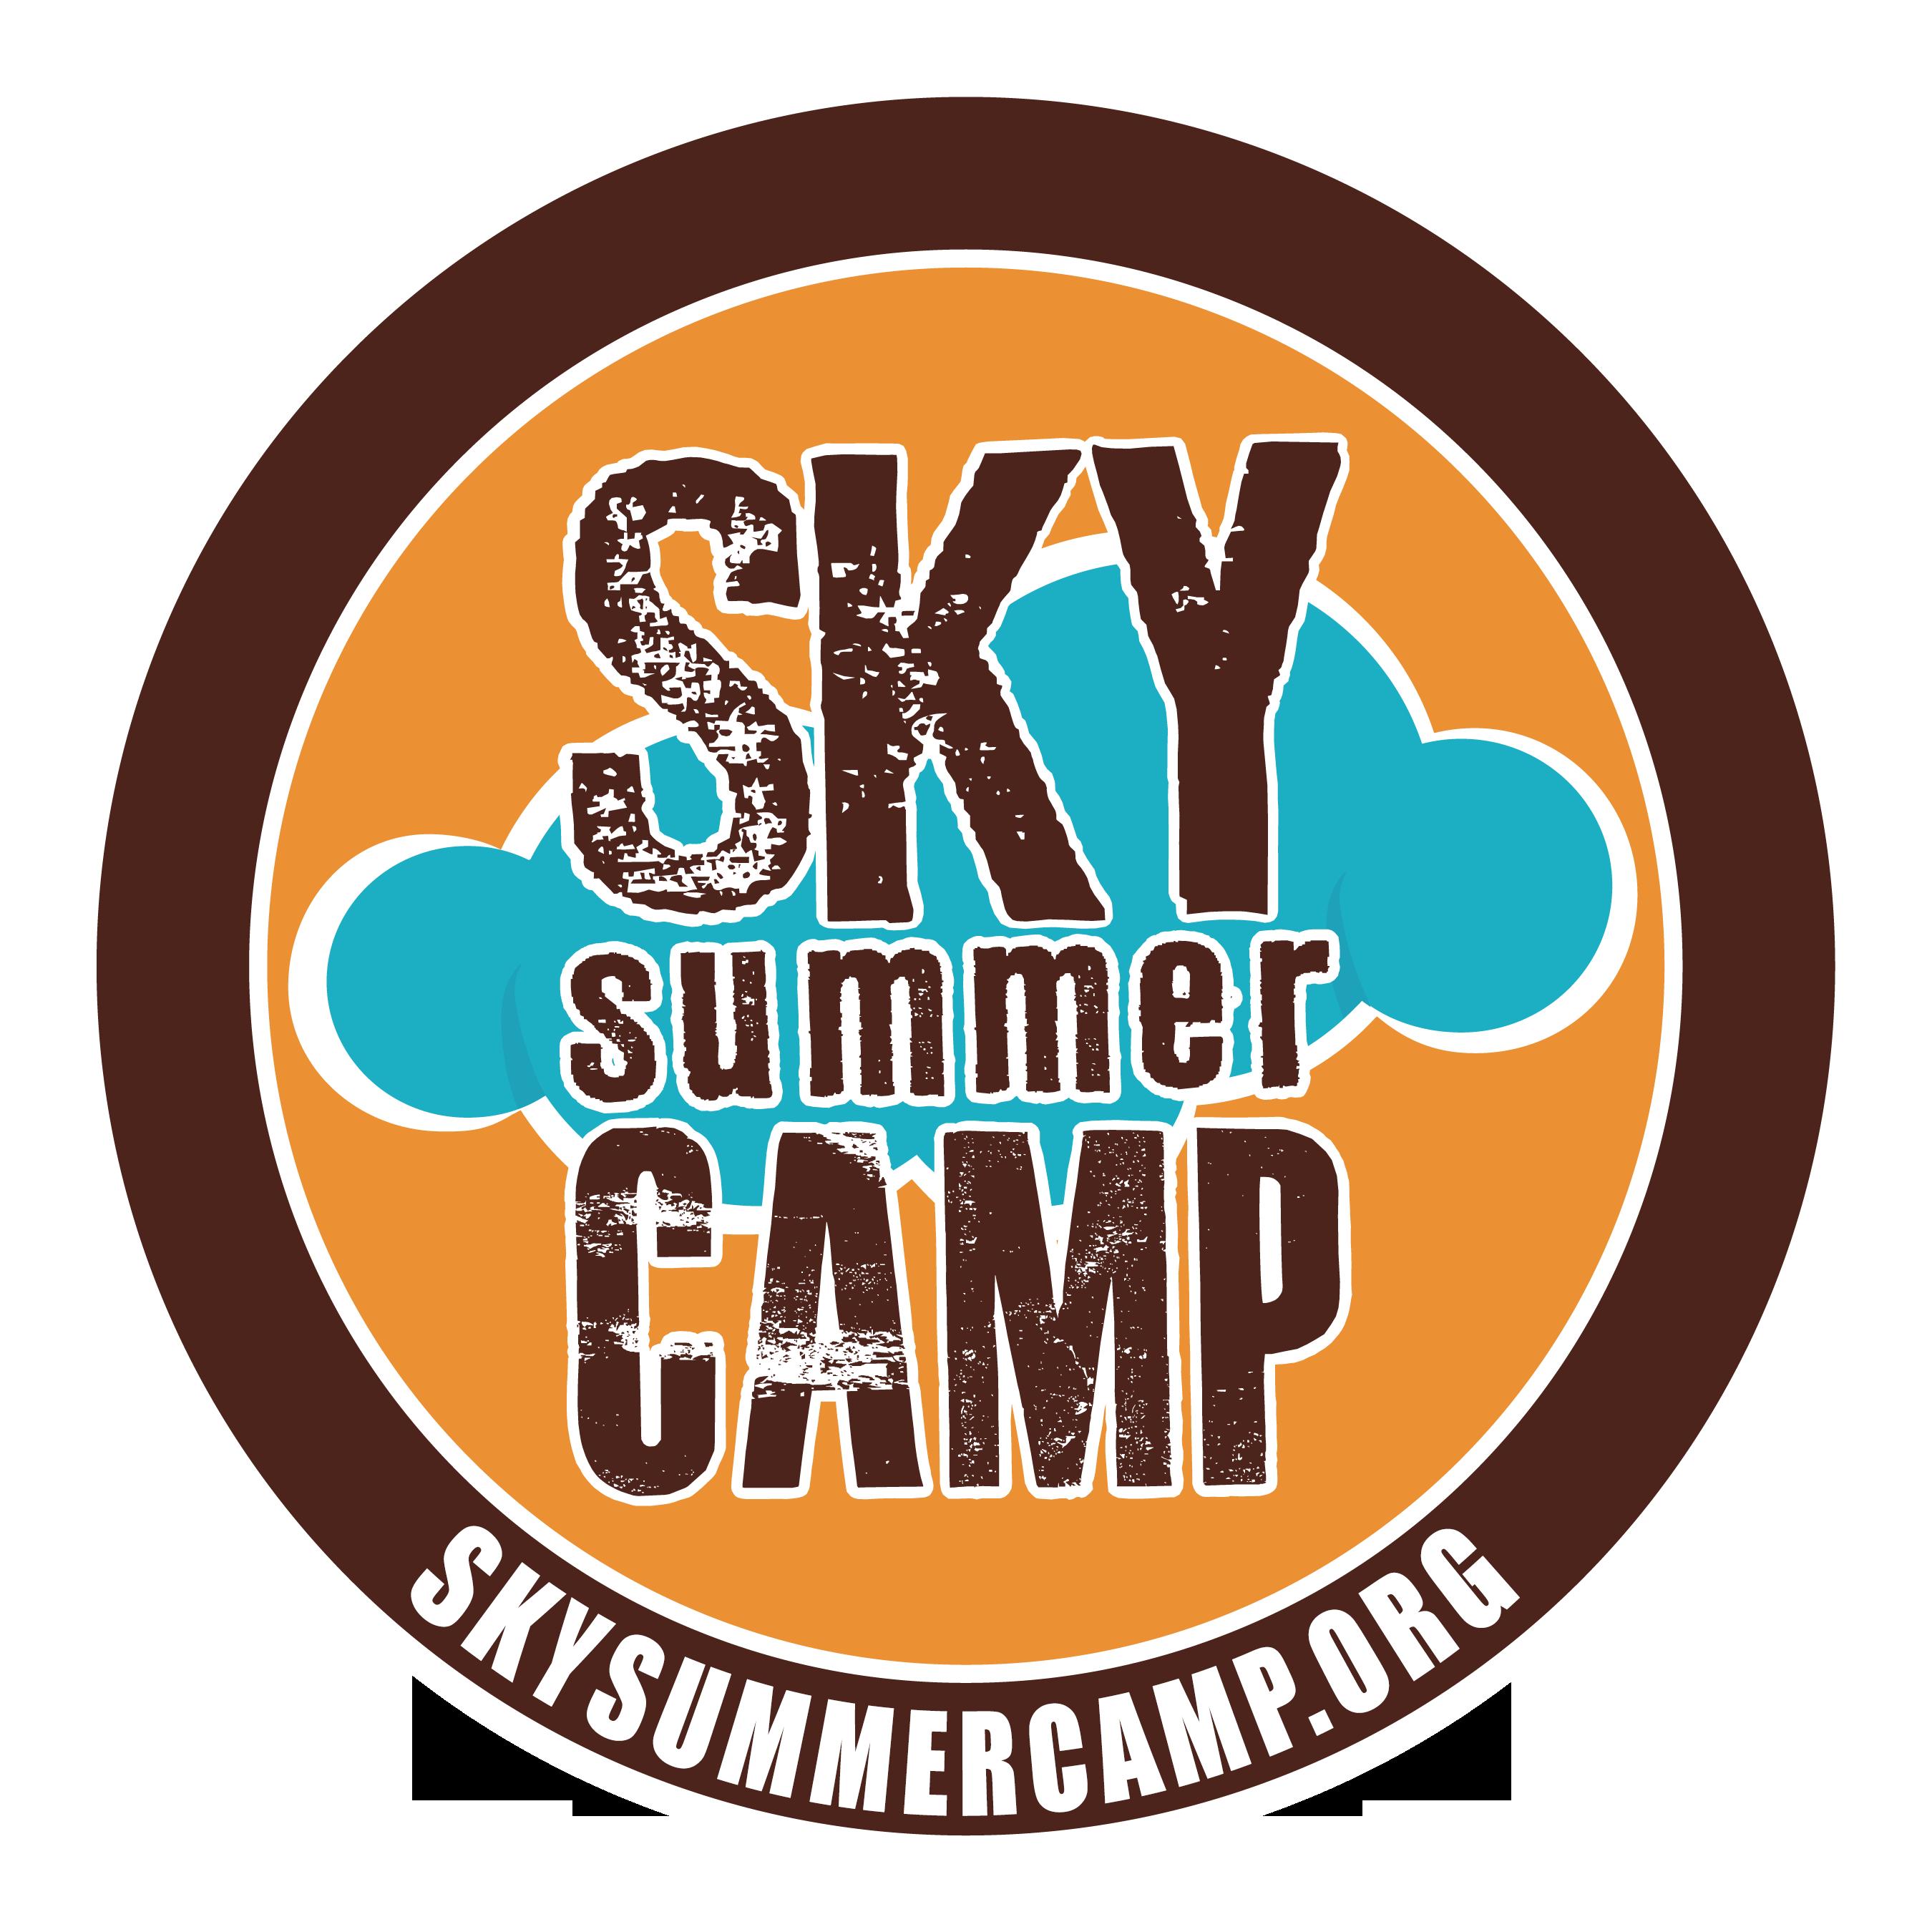 Sky Summer Camp